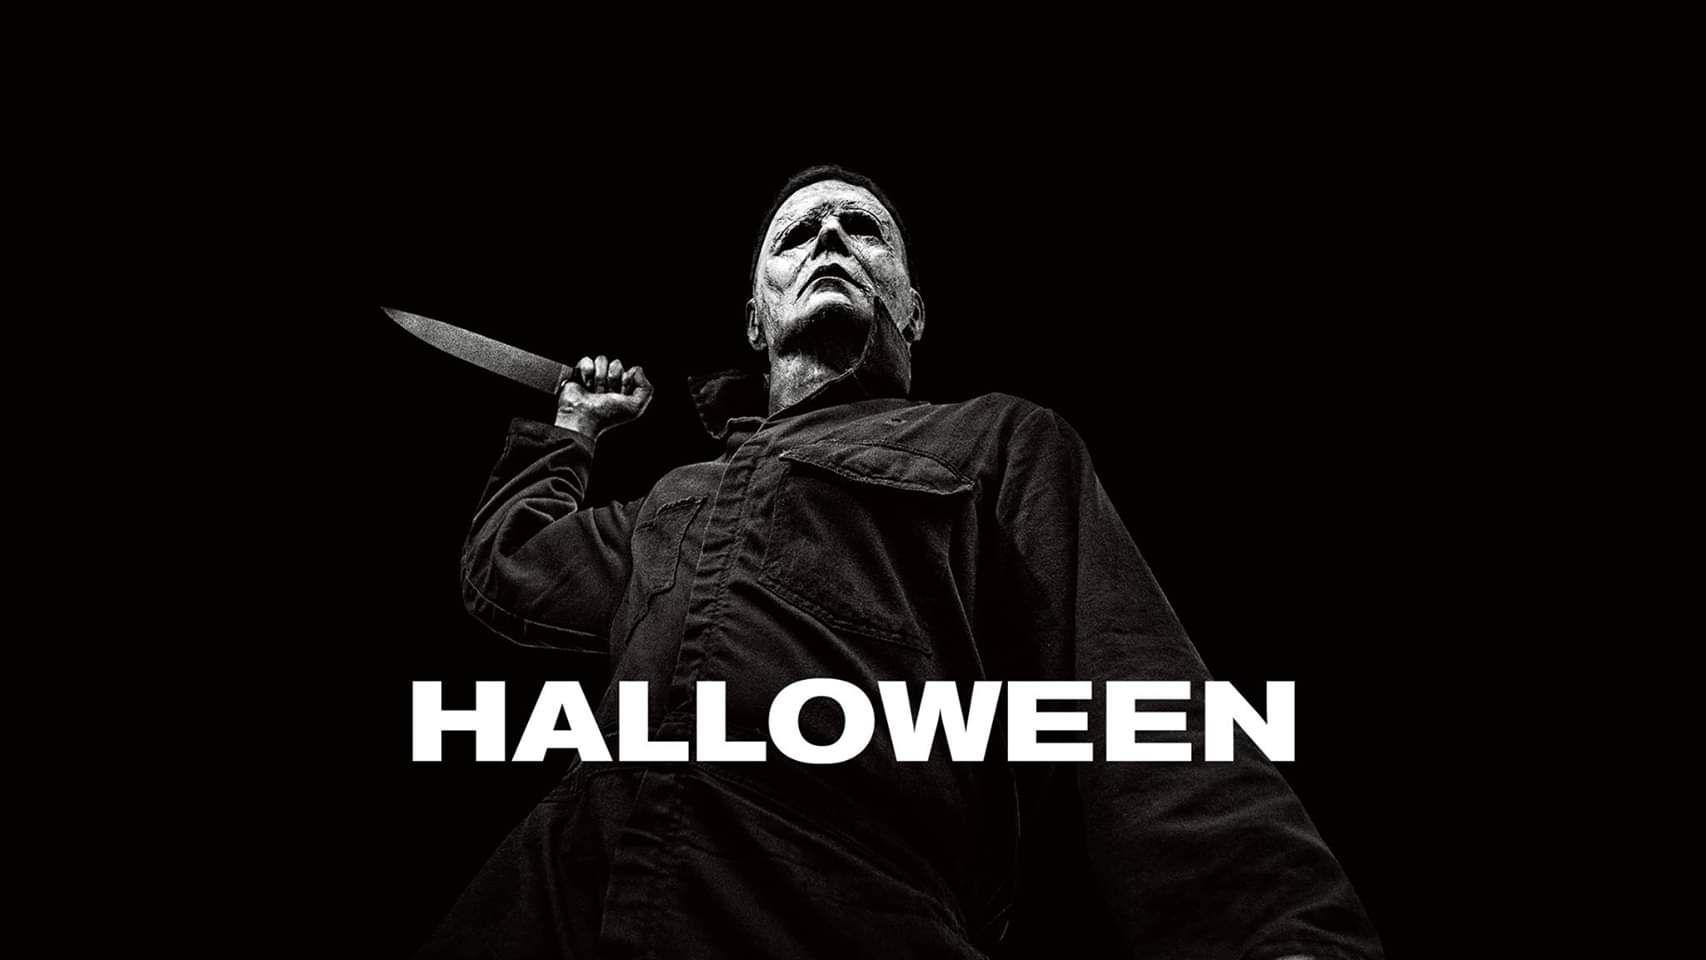 Halloween 2020 Jamie Lee Curtis Dvd Release Pin by David Luna Enterprizes on Halloween in 2020 | Dvd release